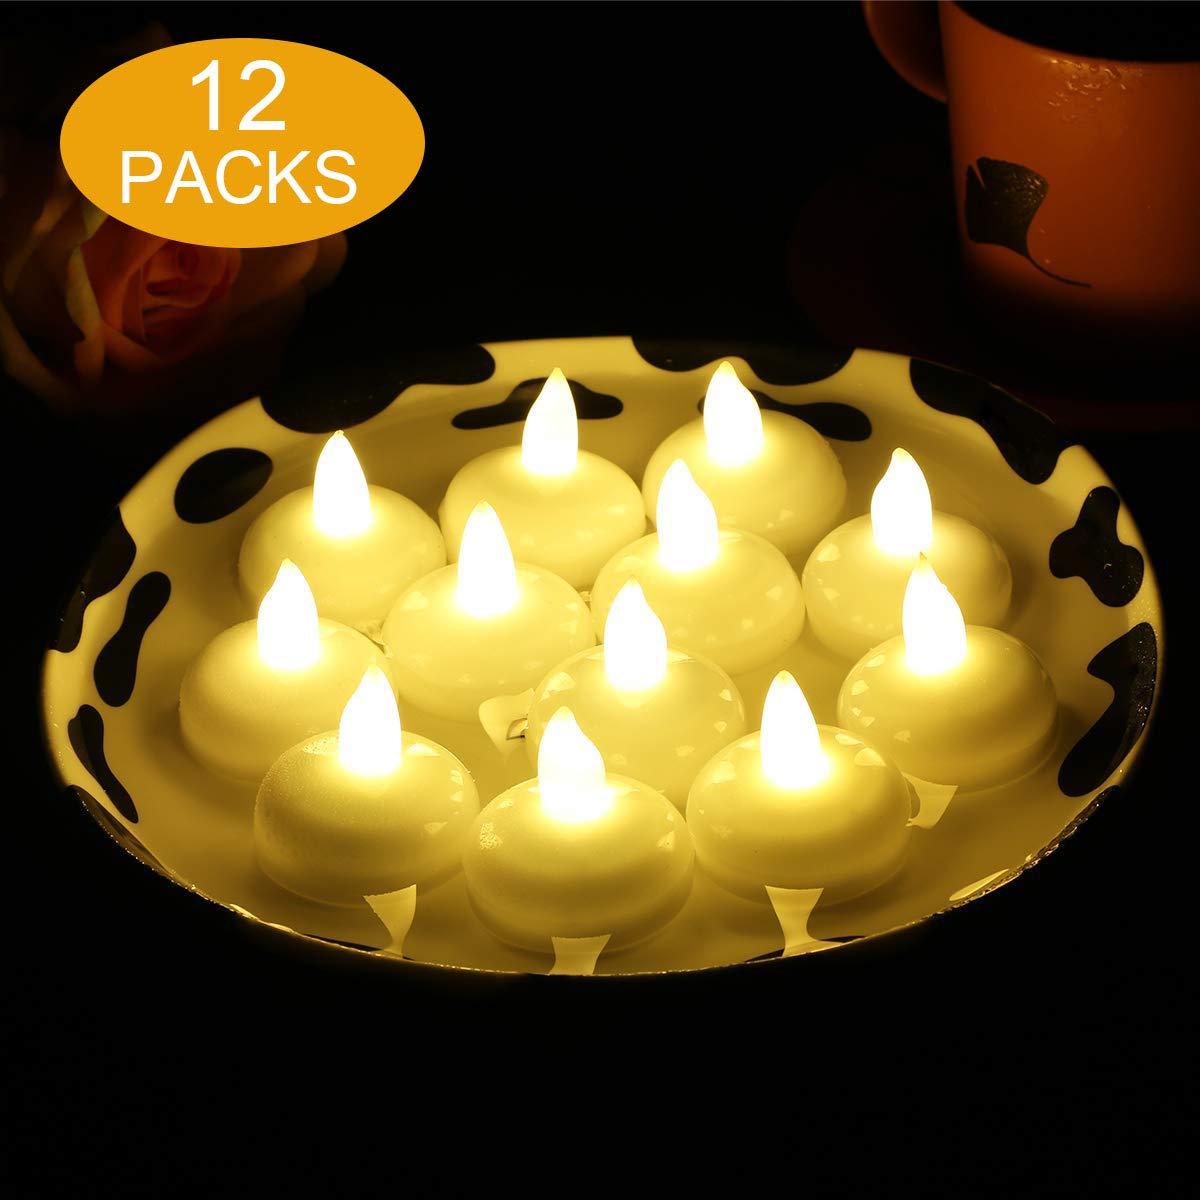 flintronic 12 Velas LED Flotantes, Velas Led de Té Velas Eléctricas con Baterías para San Valentín, Cumpleaños, Navidad, Halloween Decoración, Blanco ...